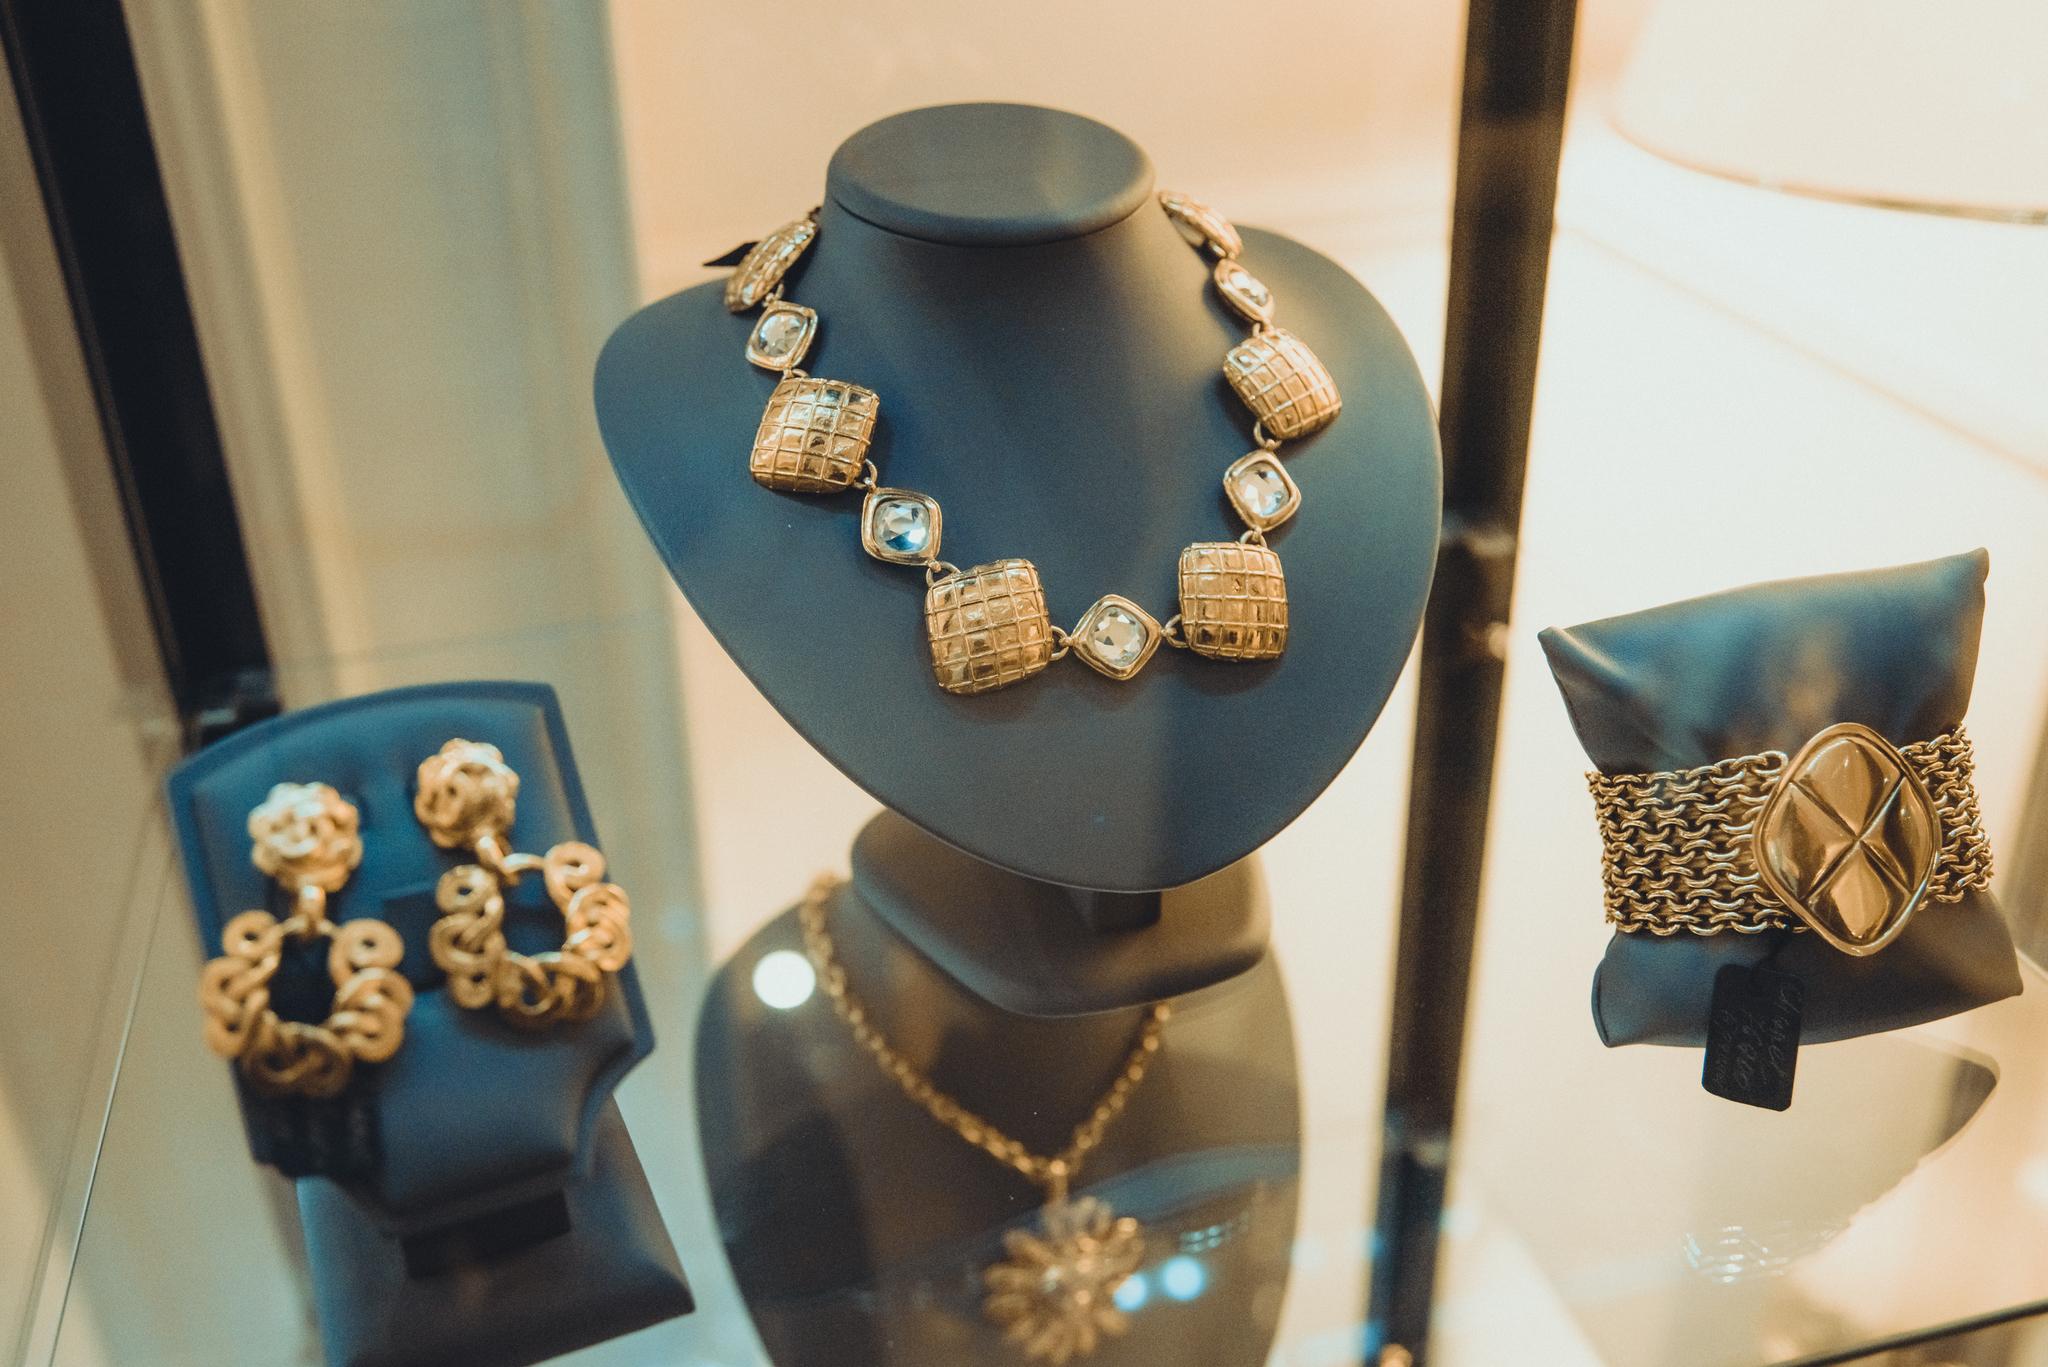 Колье Сhanel  c кристаллами  |  CHANEL Pendant Vintage Matelasse Crystal Long Necklace Gold